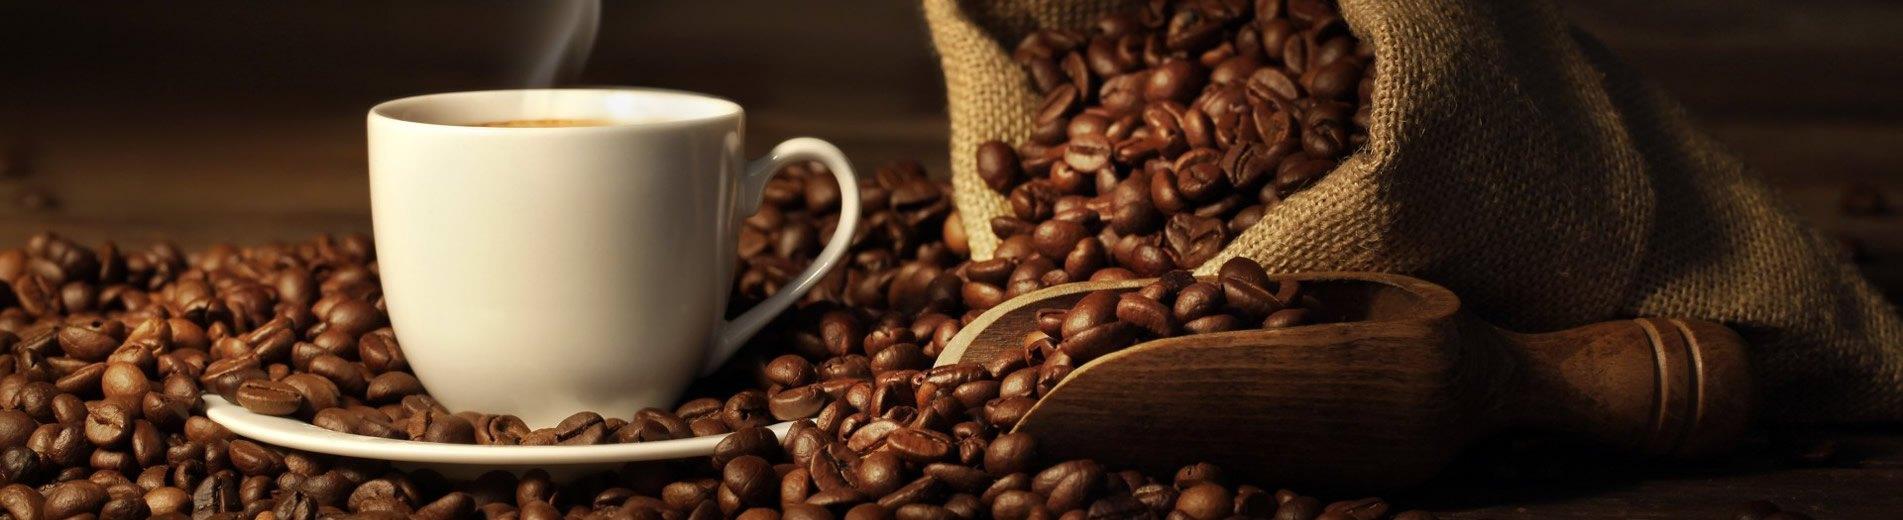 Il Caffè Ristretto: Vendita online Cialde, Capsule, Macchine Caffè